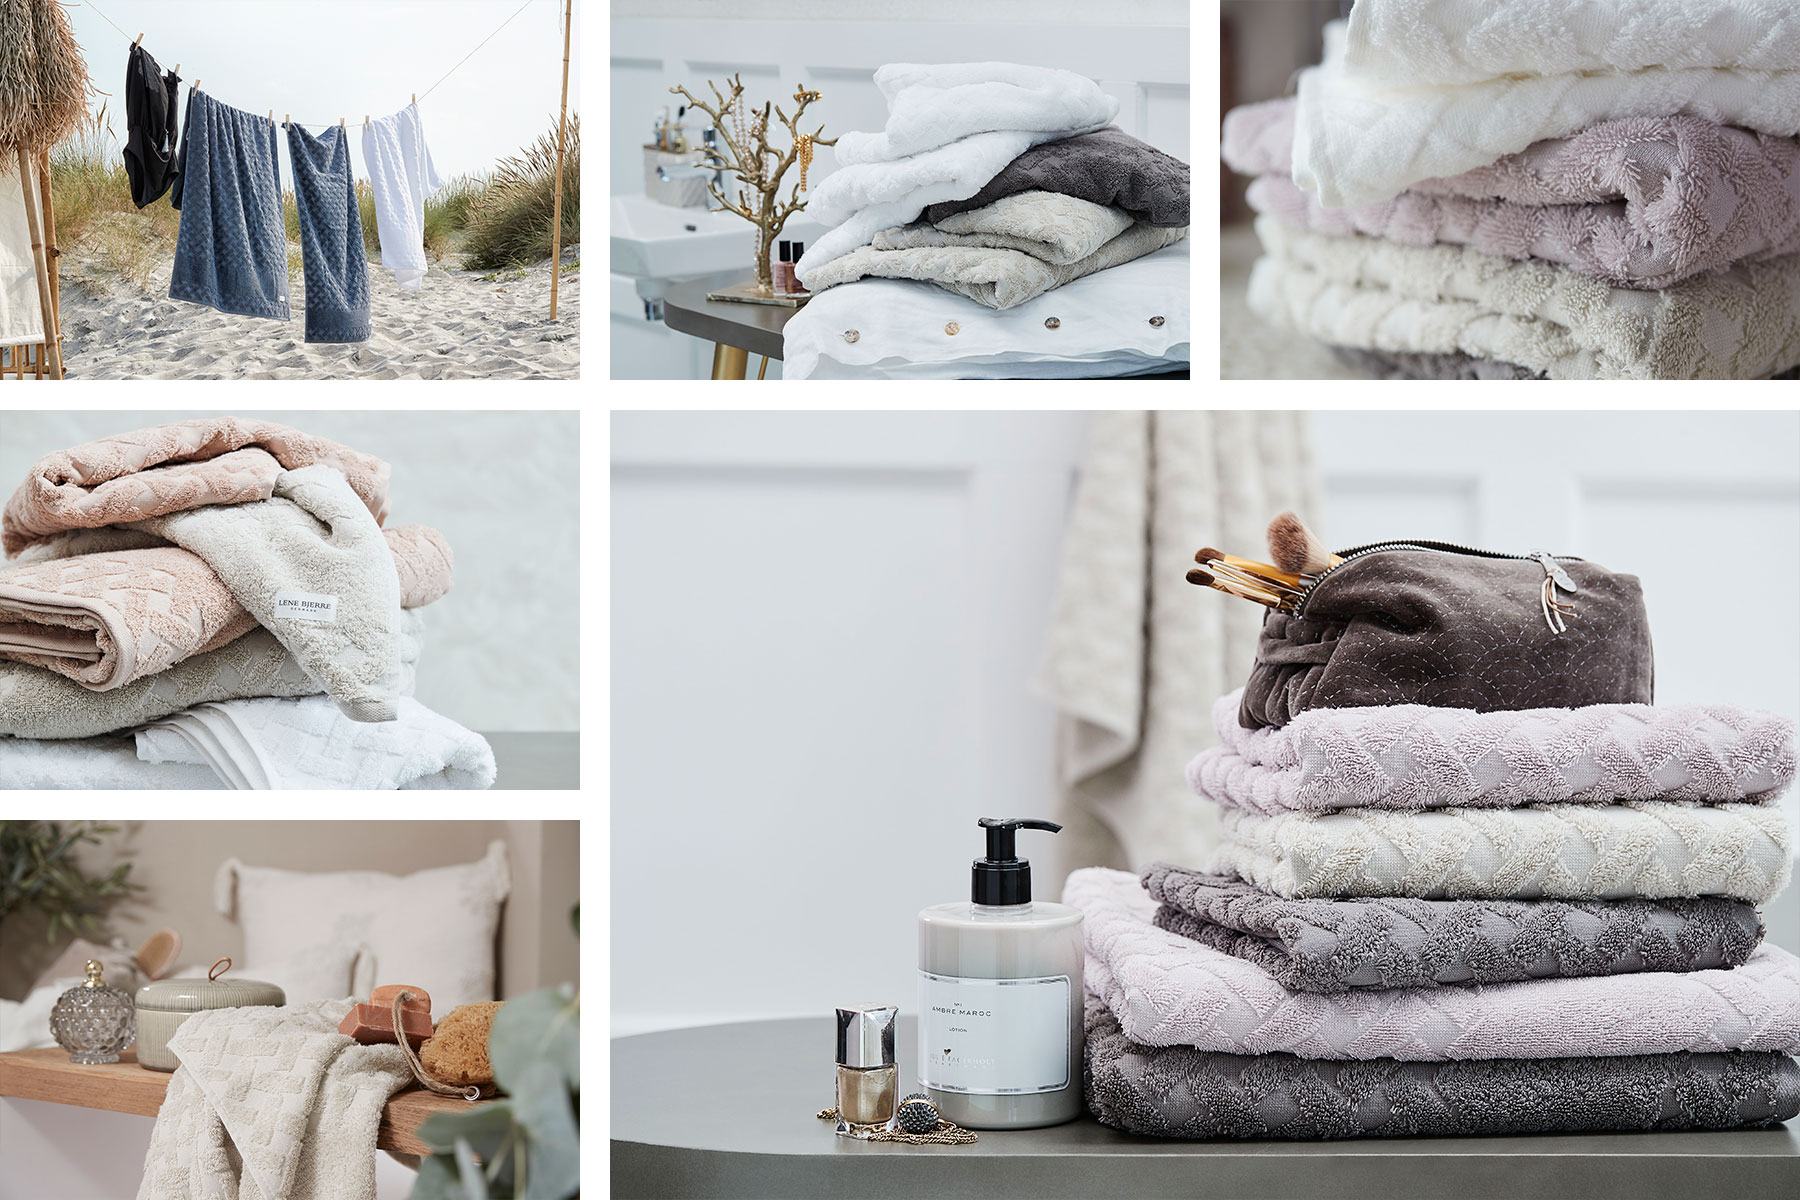 Lene Bjerre wholesale bath towels